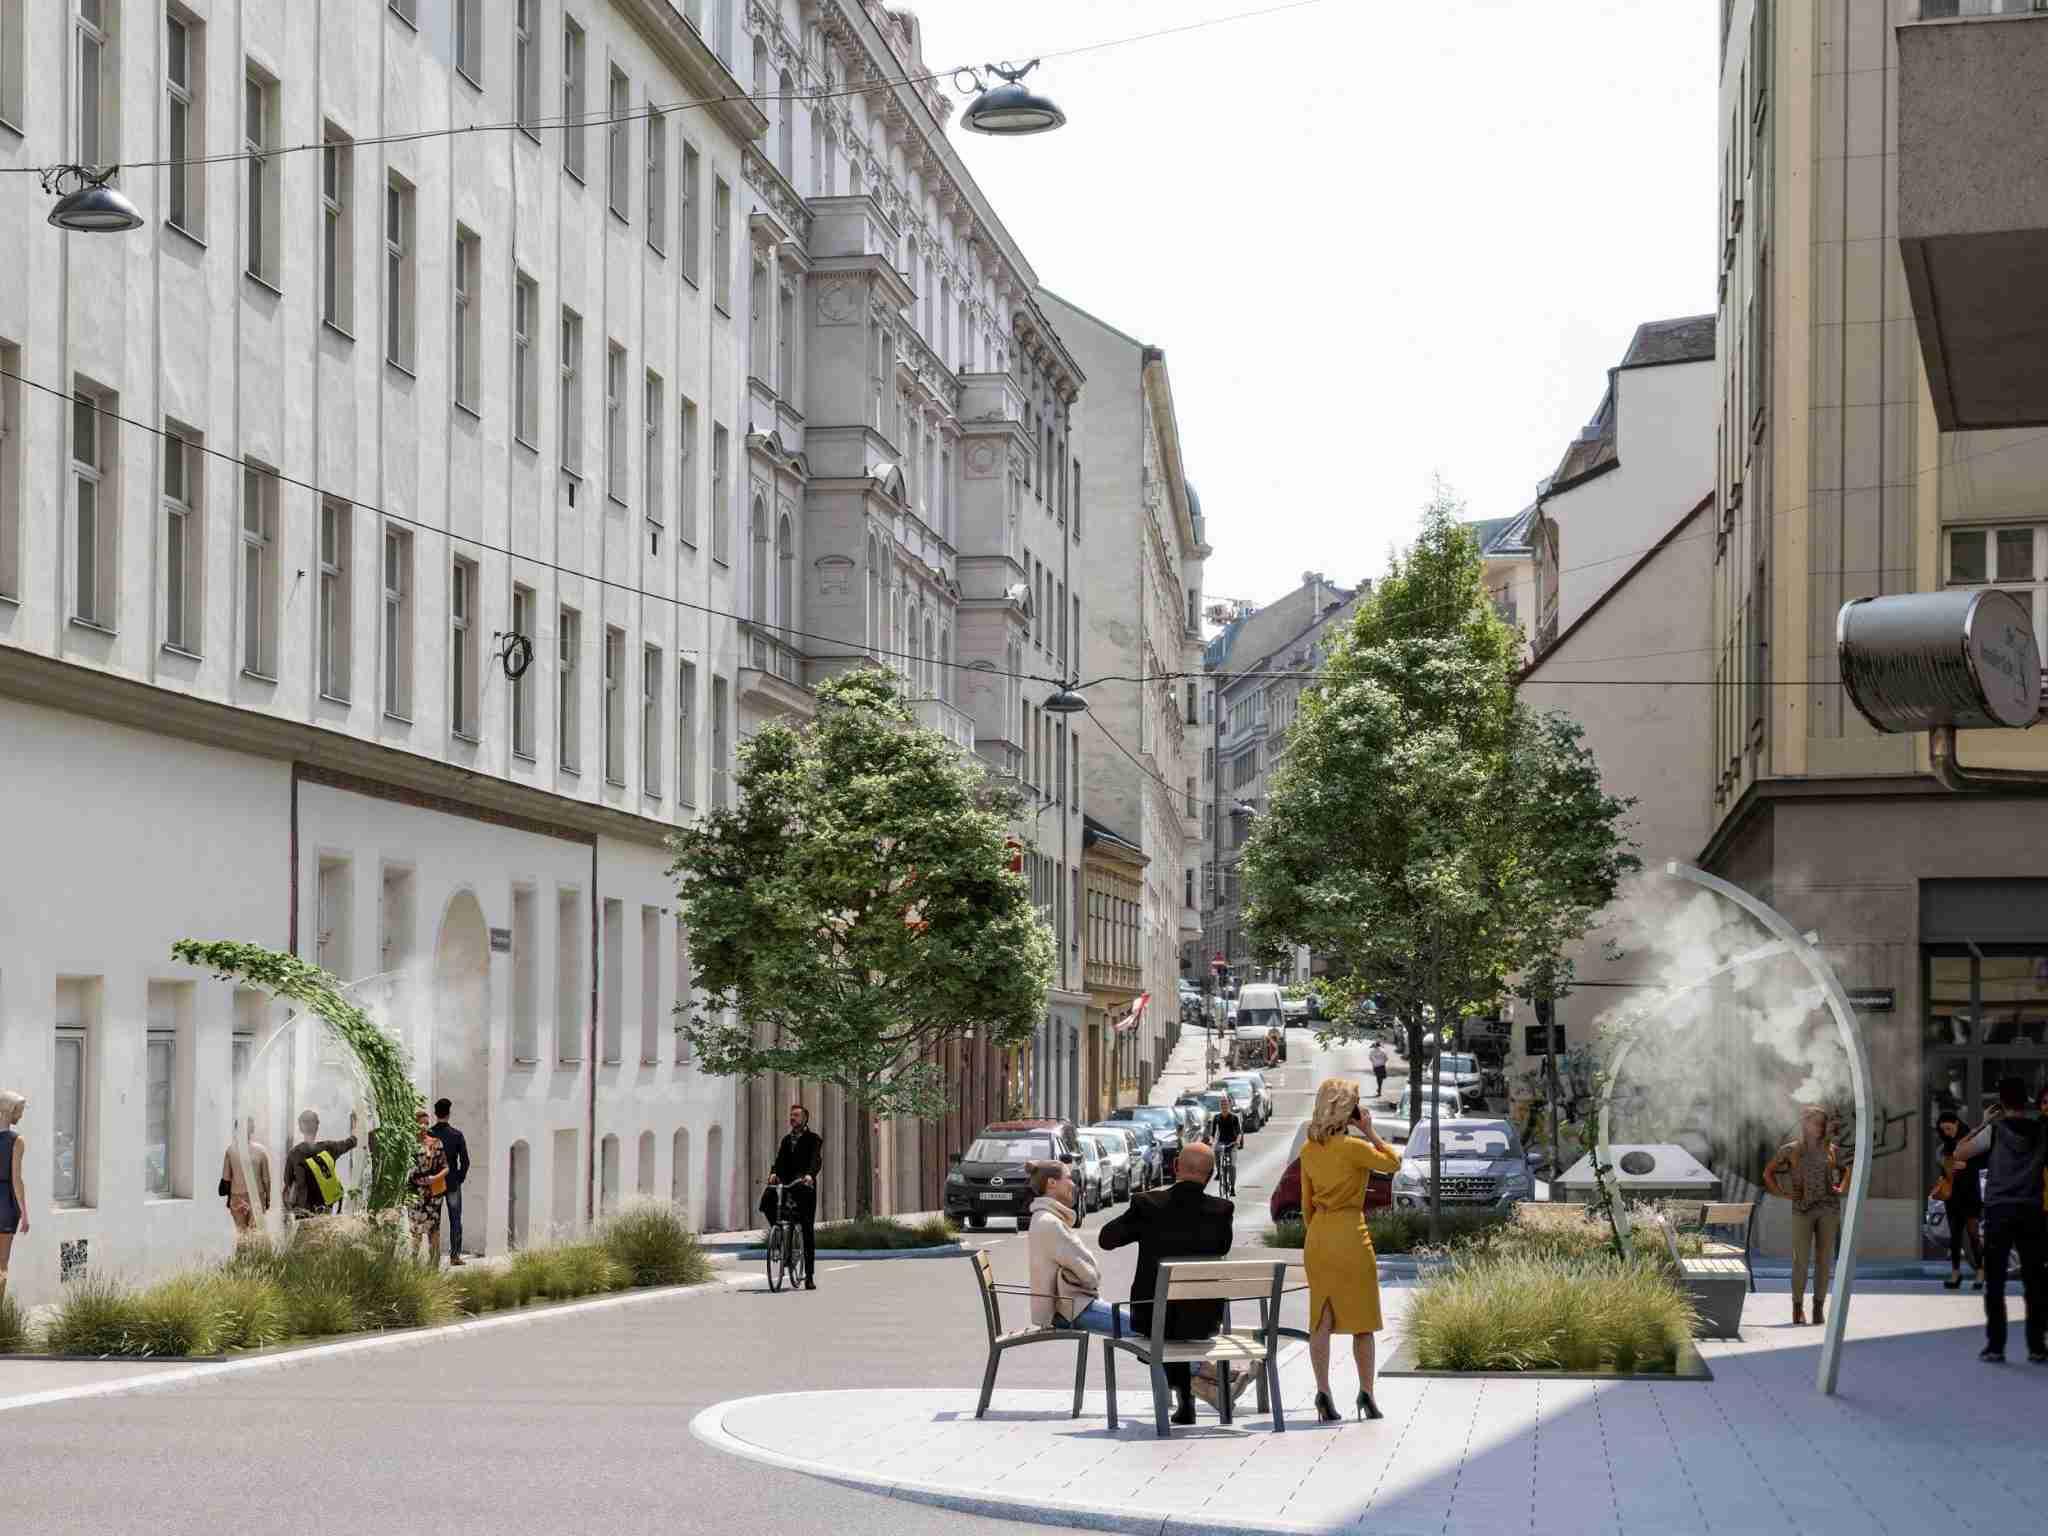 Vienna's new mist cooling system - Sommerspritzer